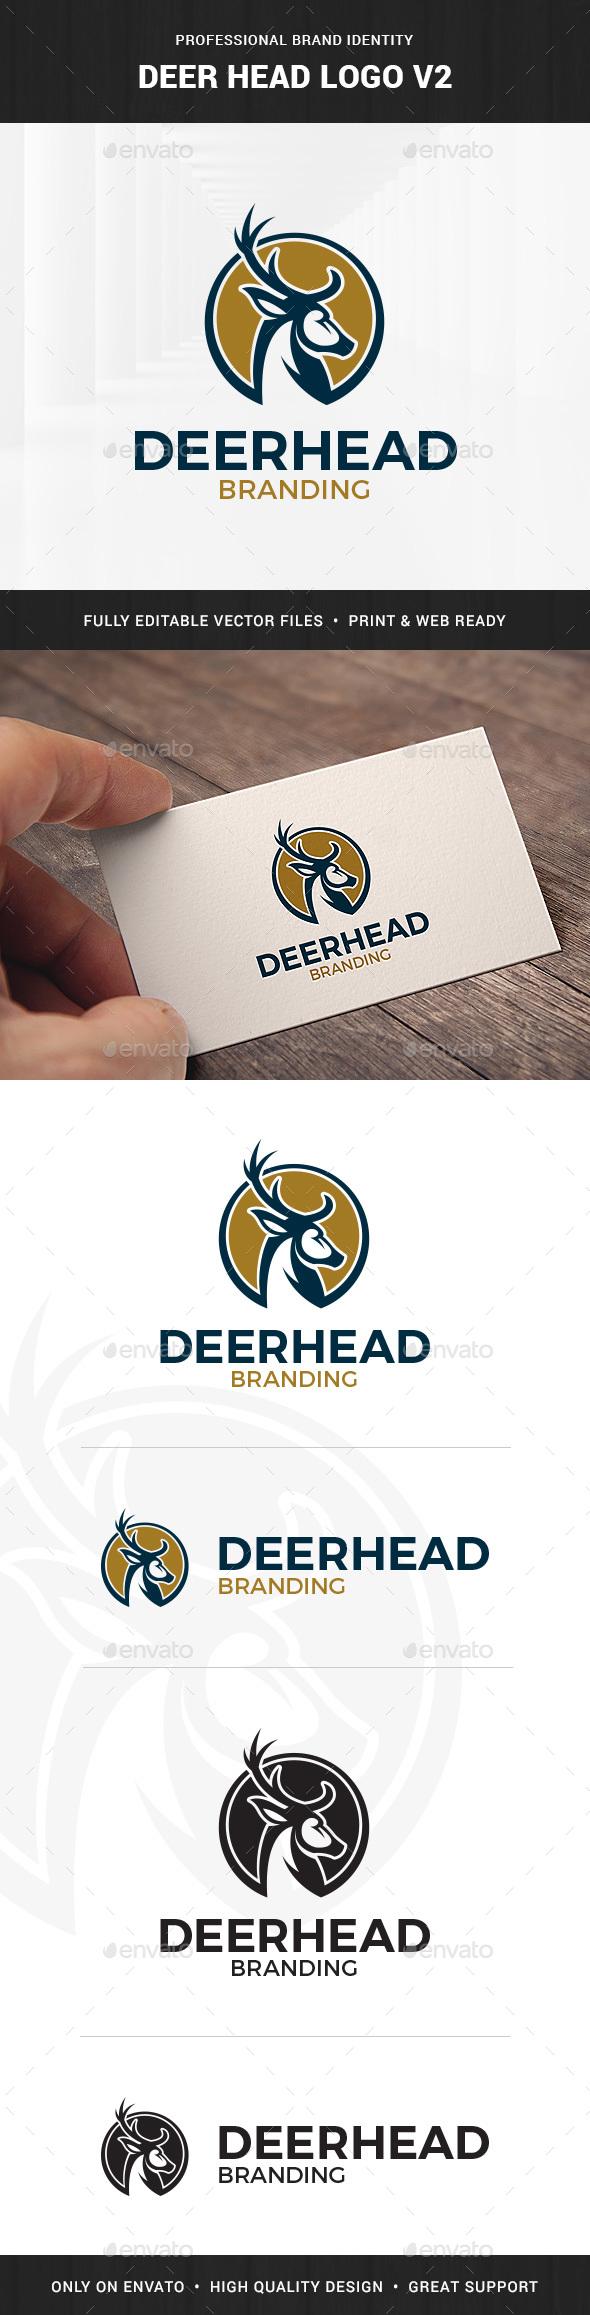 Deer Head Logo Template v2